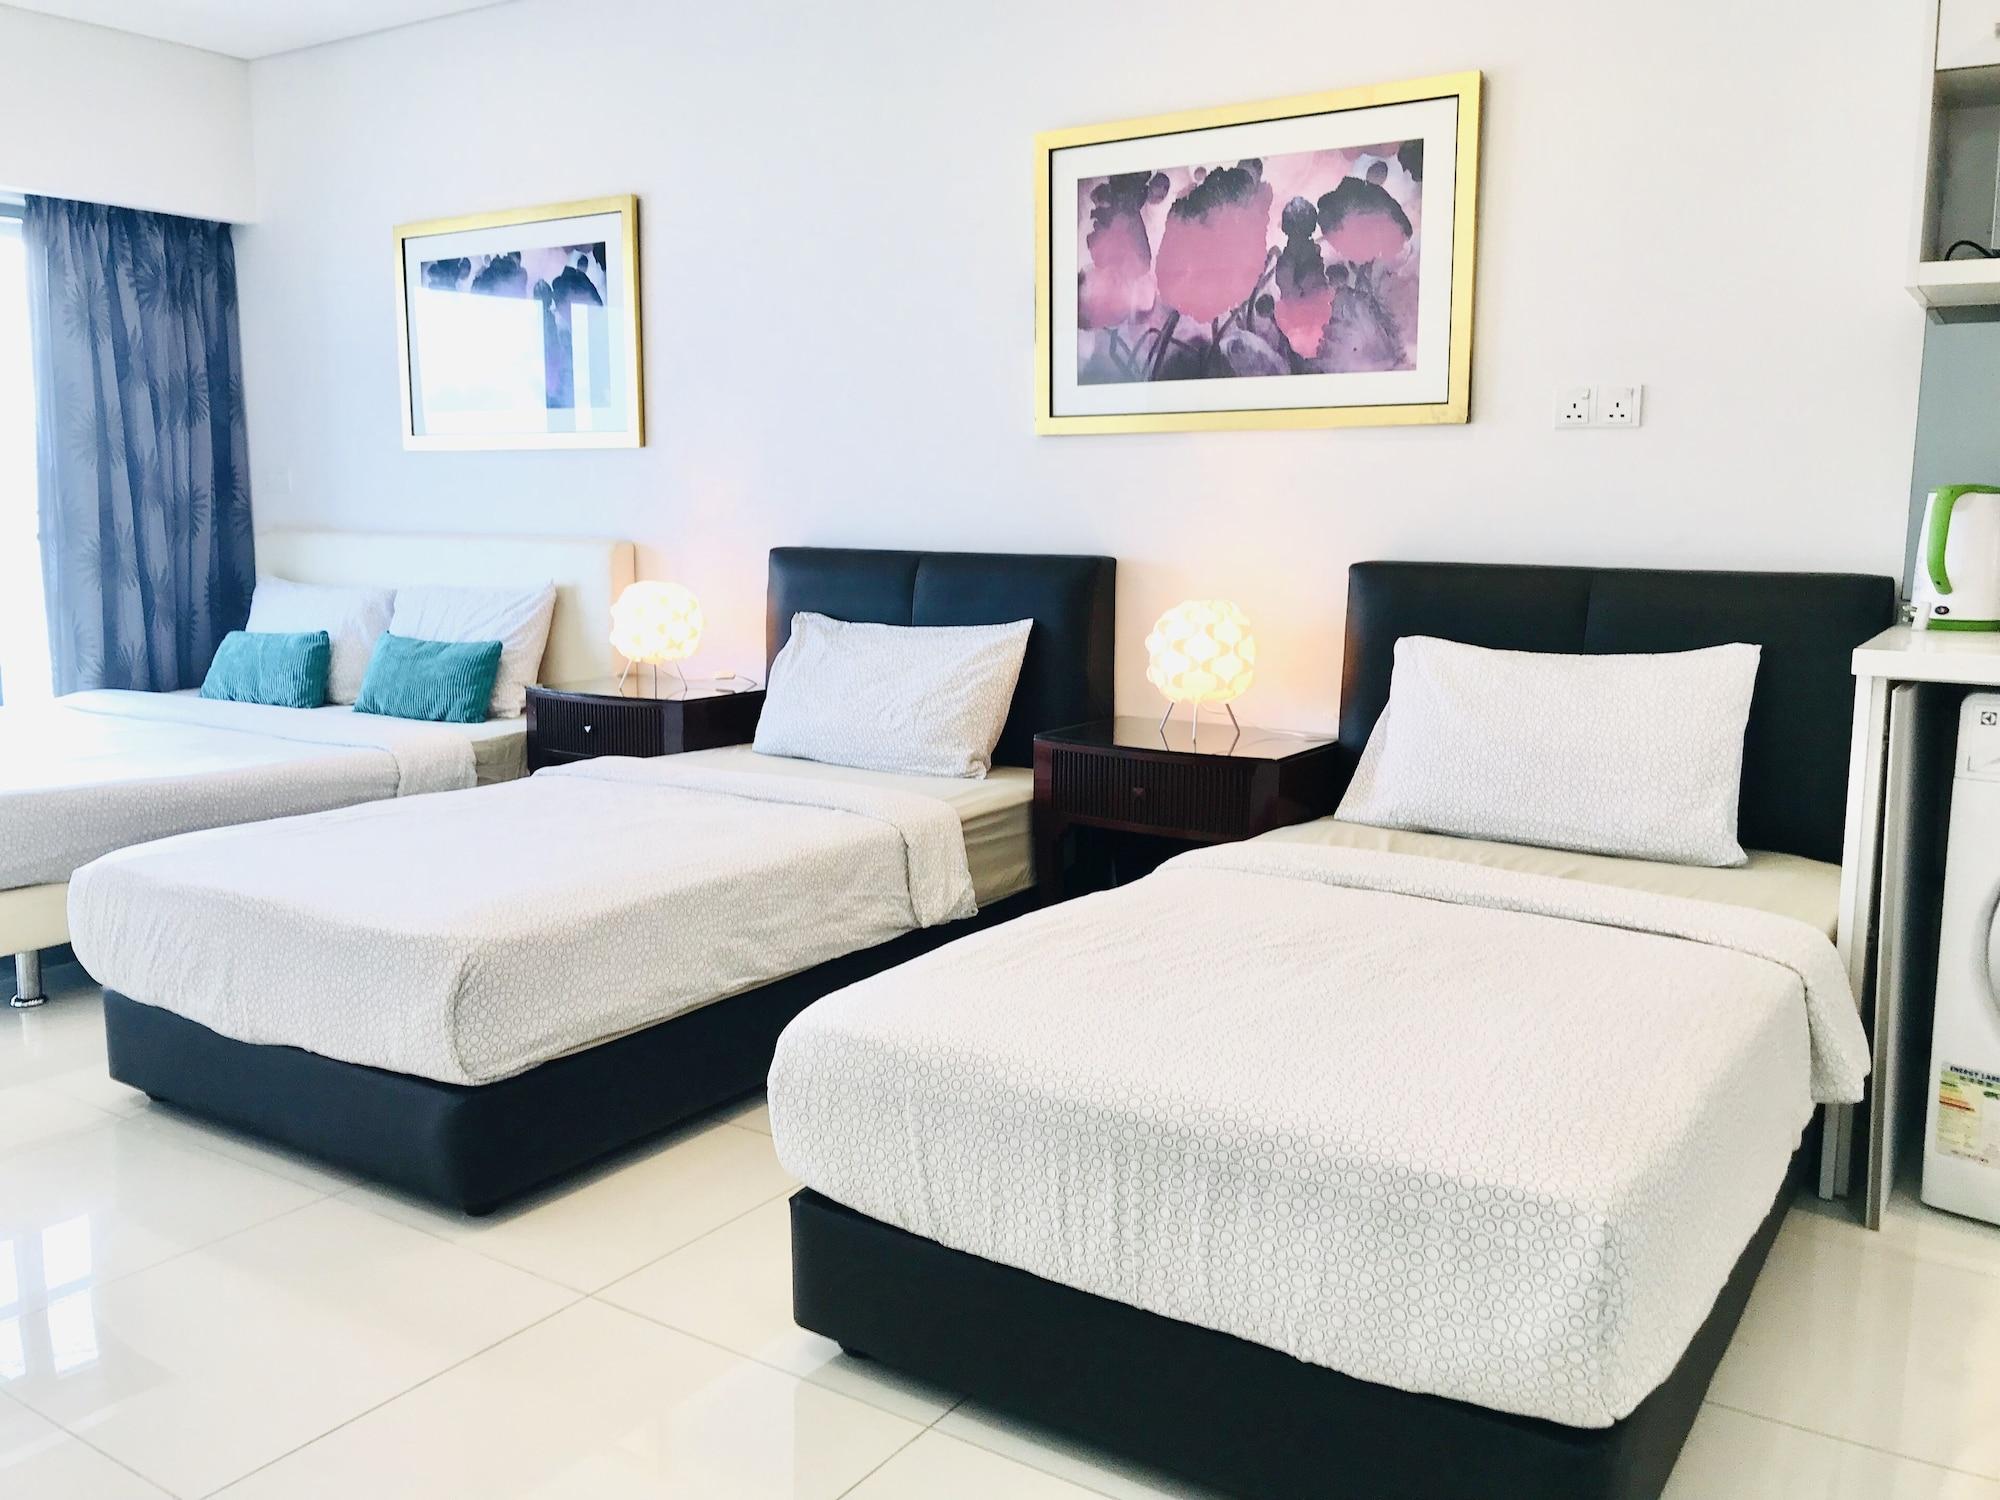 Summer Suites Vacation Home, Kuala Lumpur